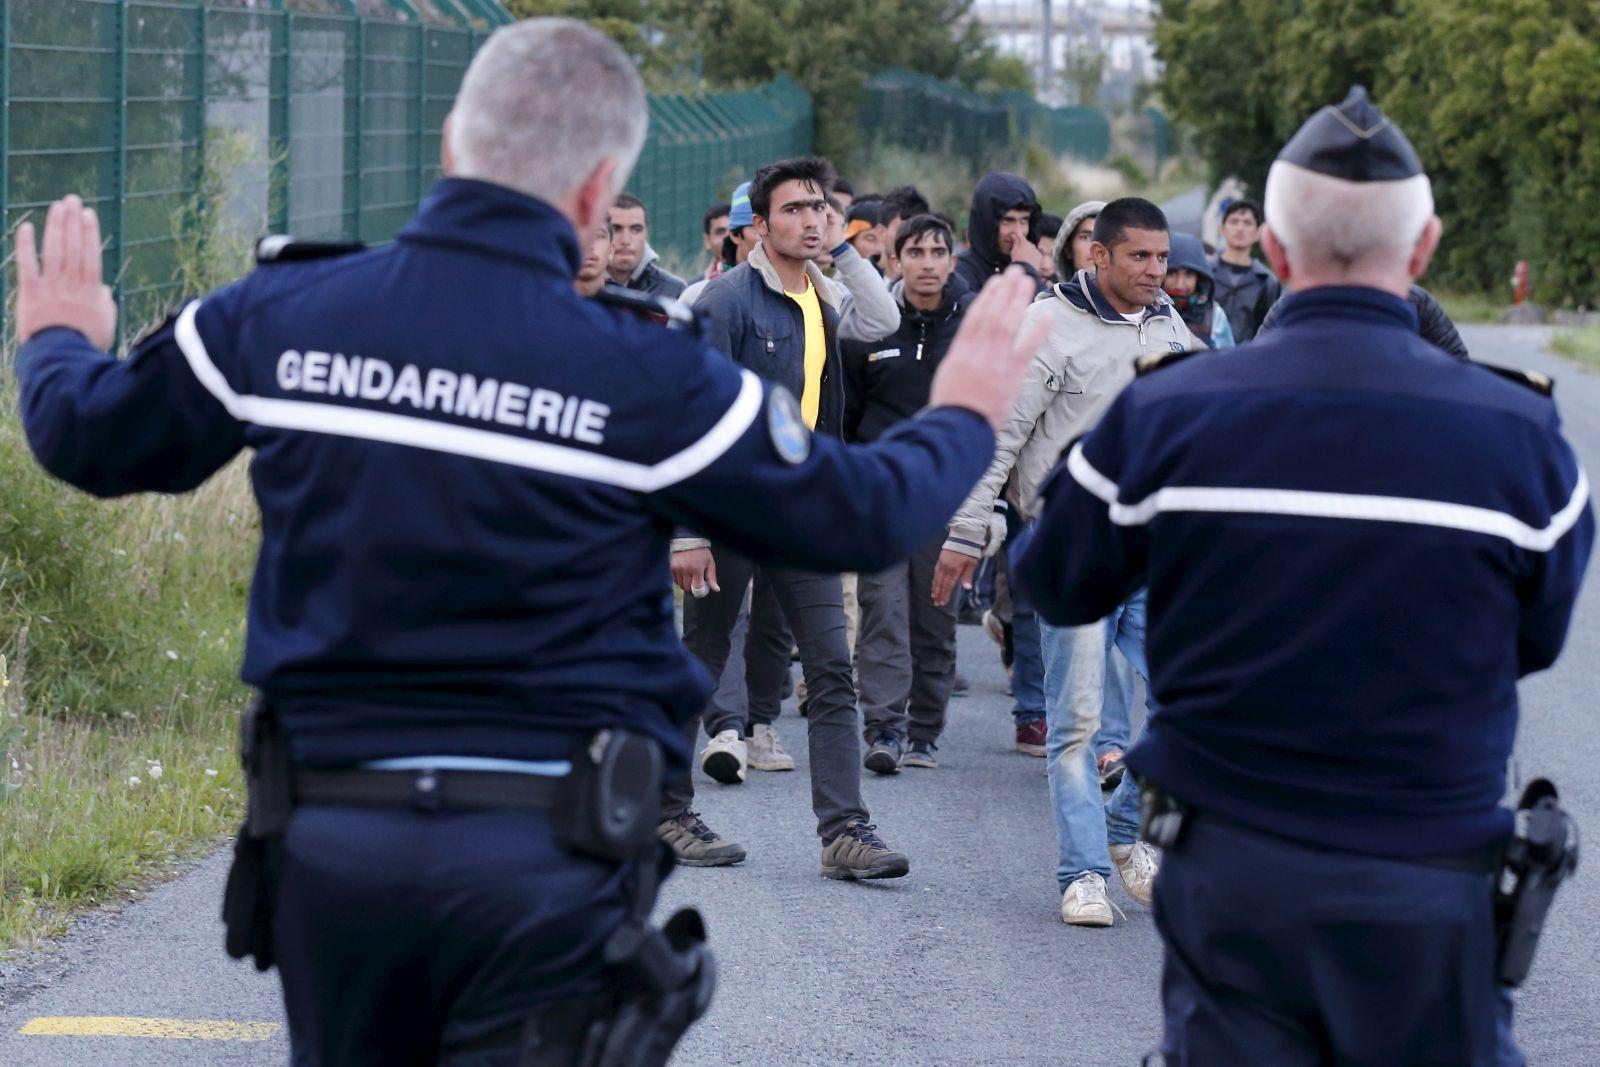 EU helps with Calais migrant crisis